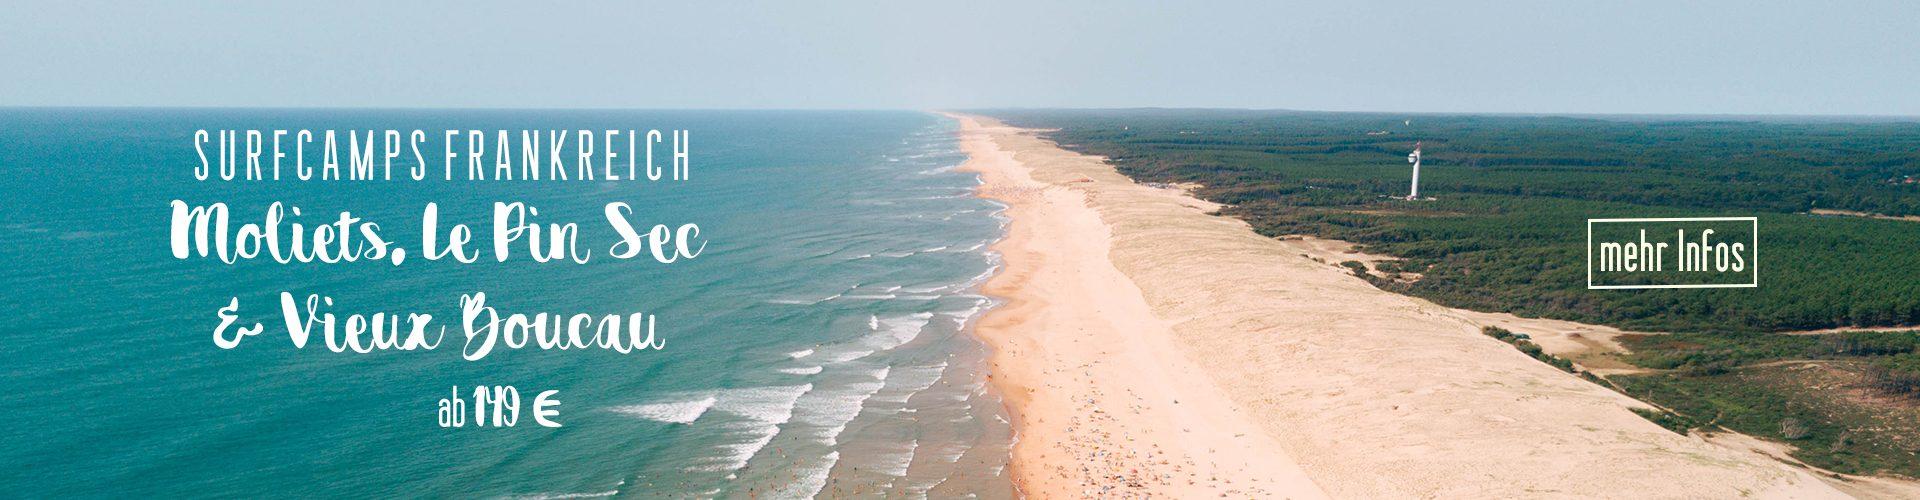 Surfcamps Frankreich